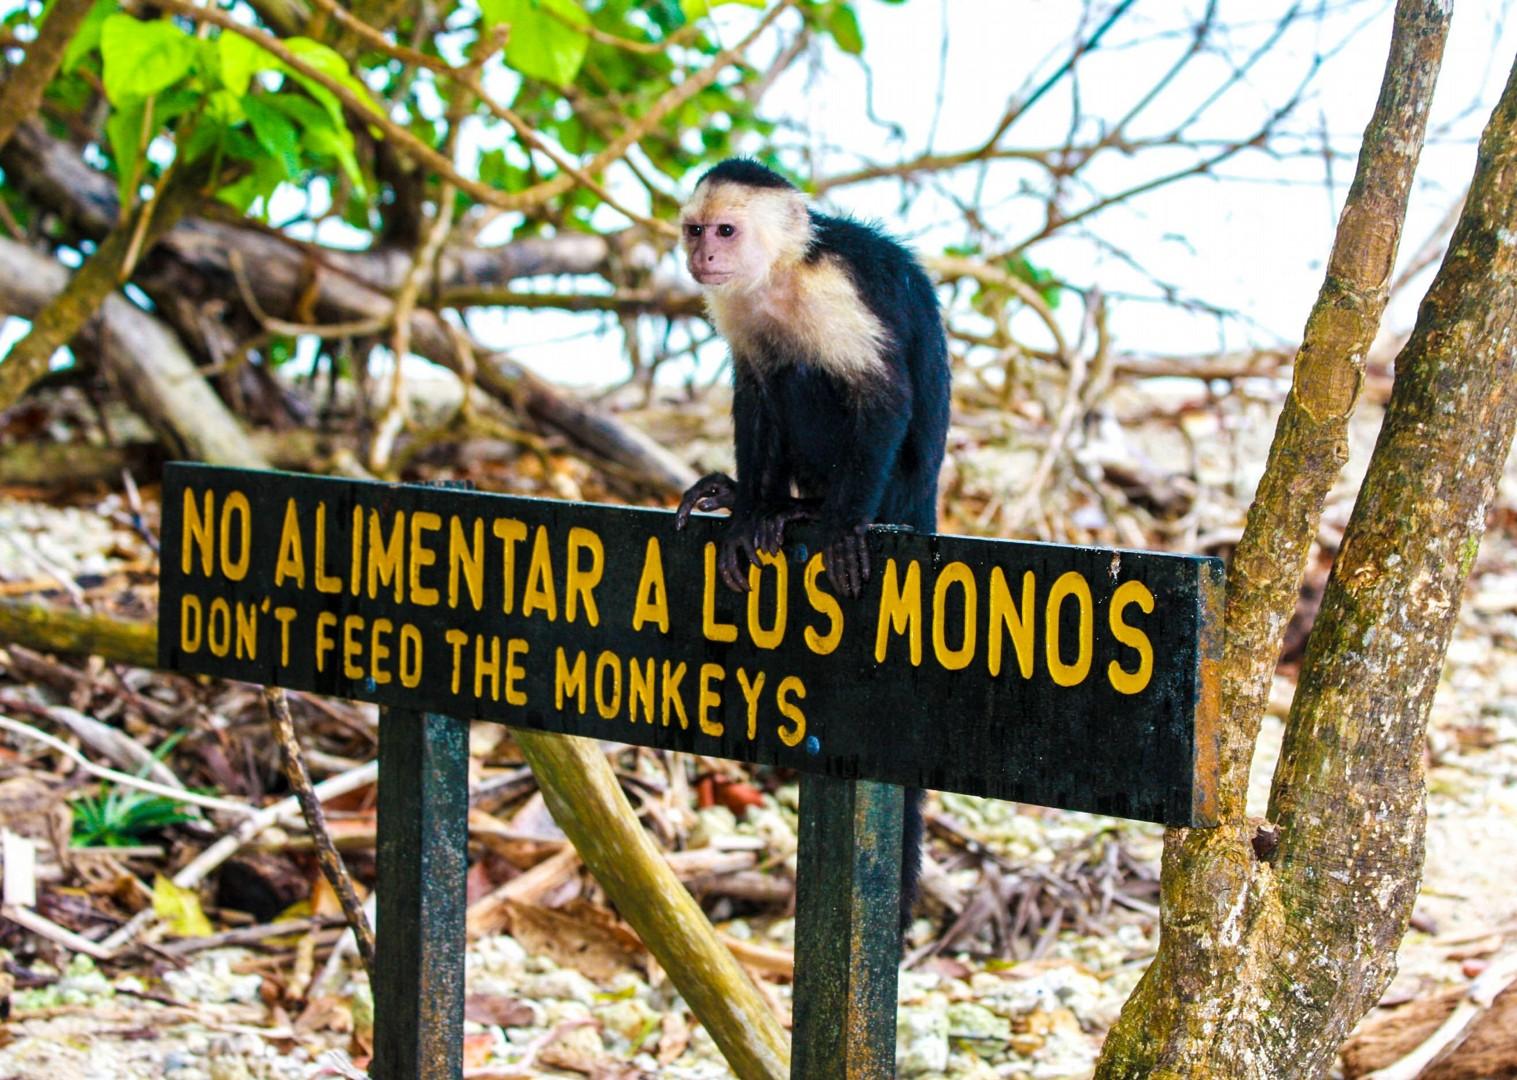 4885073294_019fb507ea_o.jpg - Costa Rica - Ruta de los Volcanes - Road Cycling